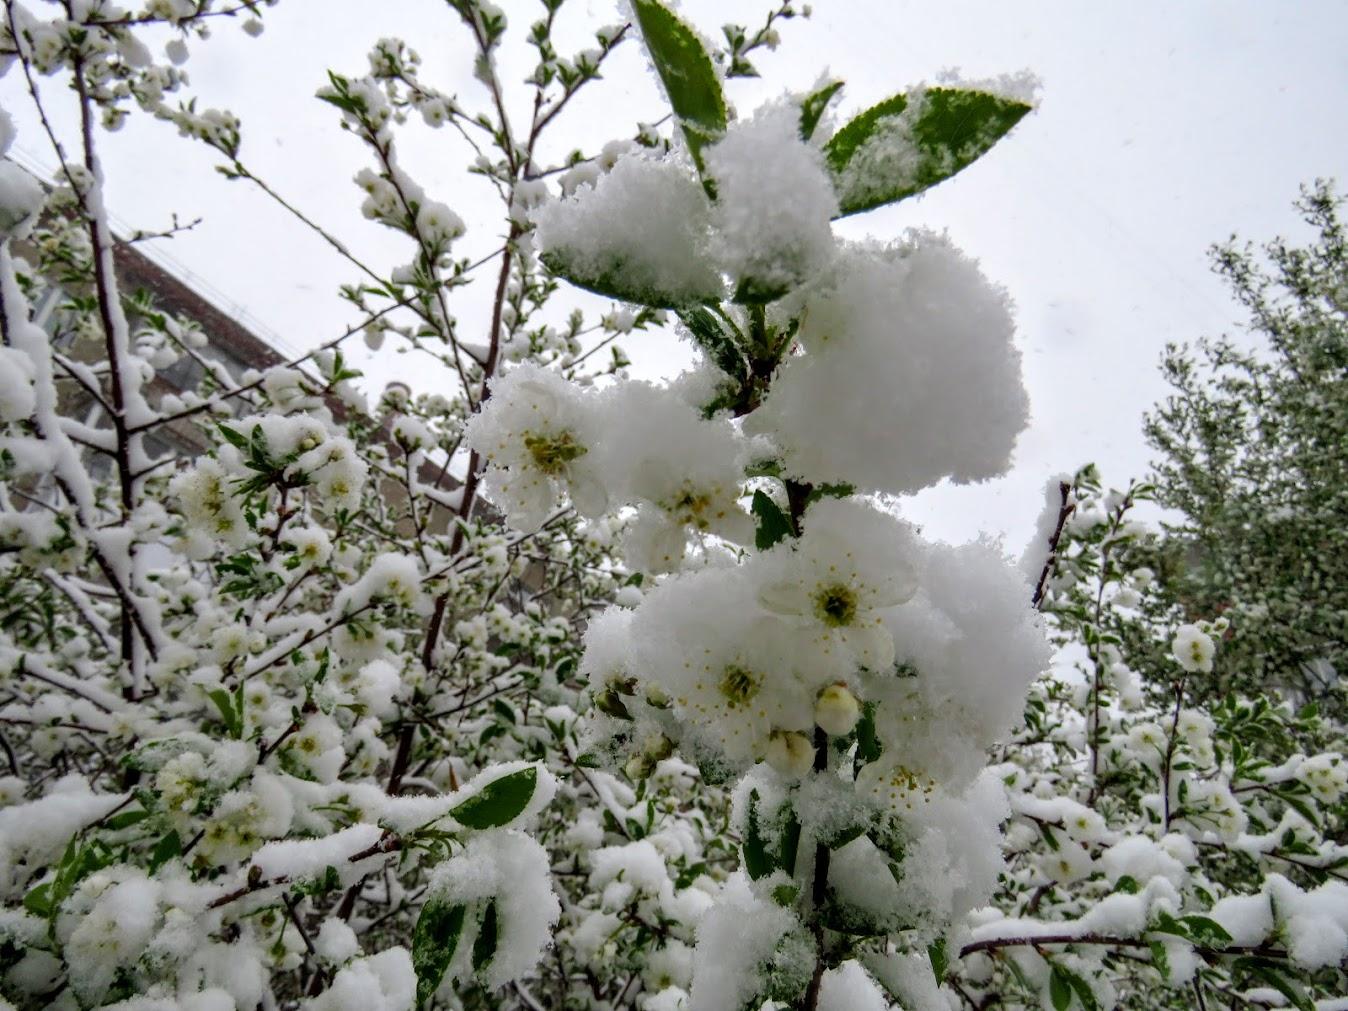 с майским снегом картинки гиф далее под